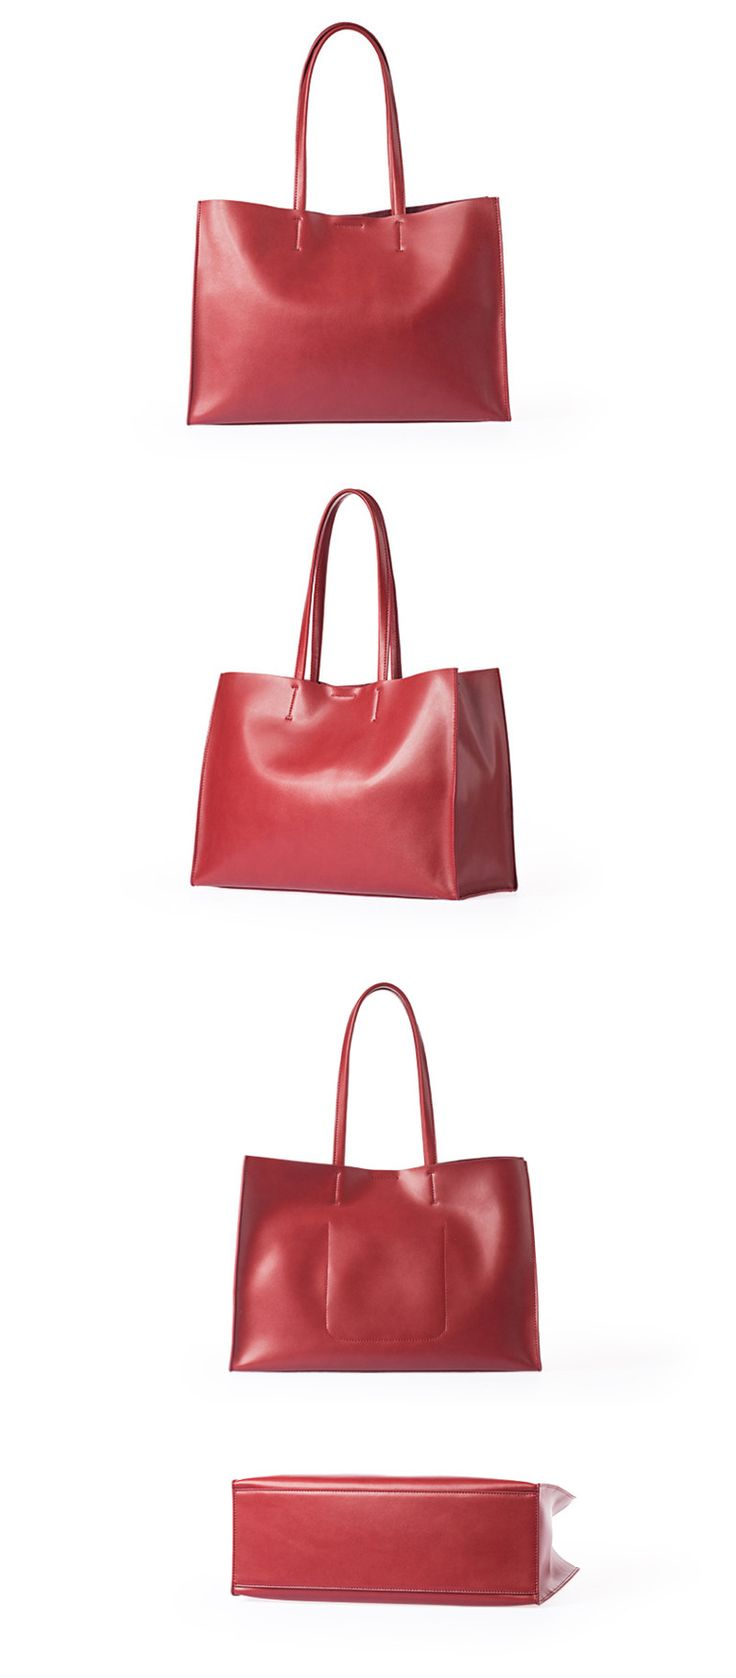 Leather Women Tote Bag Shopping Bag Shoulder Bag •Magnet closure. •Inside a small bag •Brass hardware •Length: 38.5cm; Height: 27cm; Width: 14cm; •Color:Brown/Red